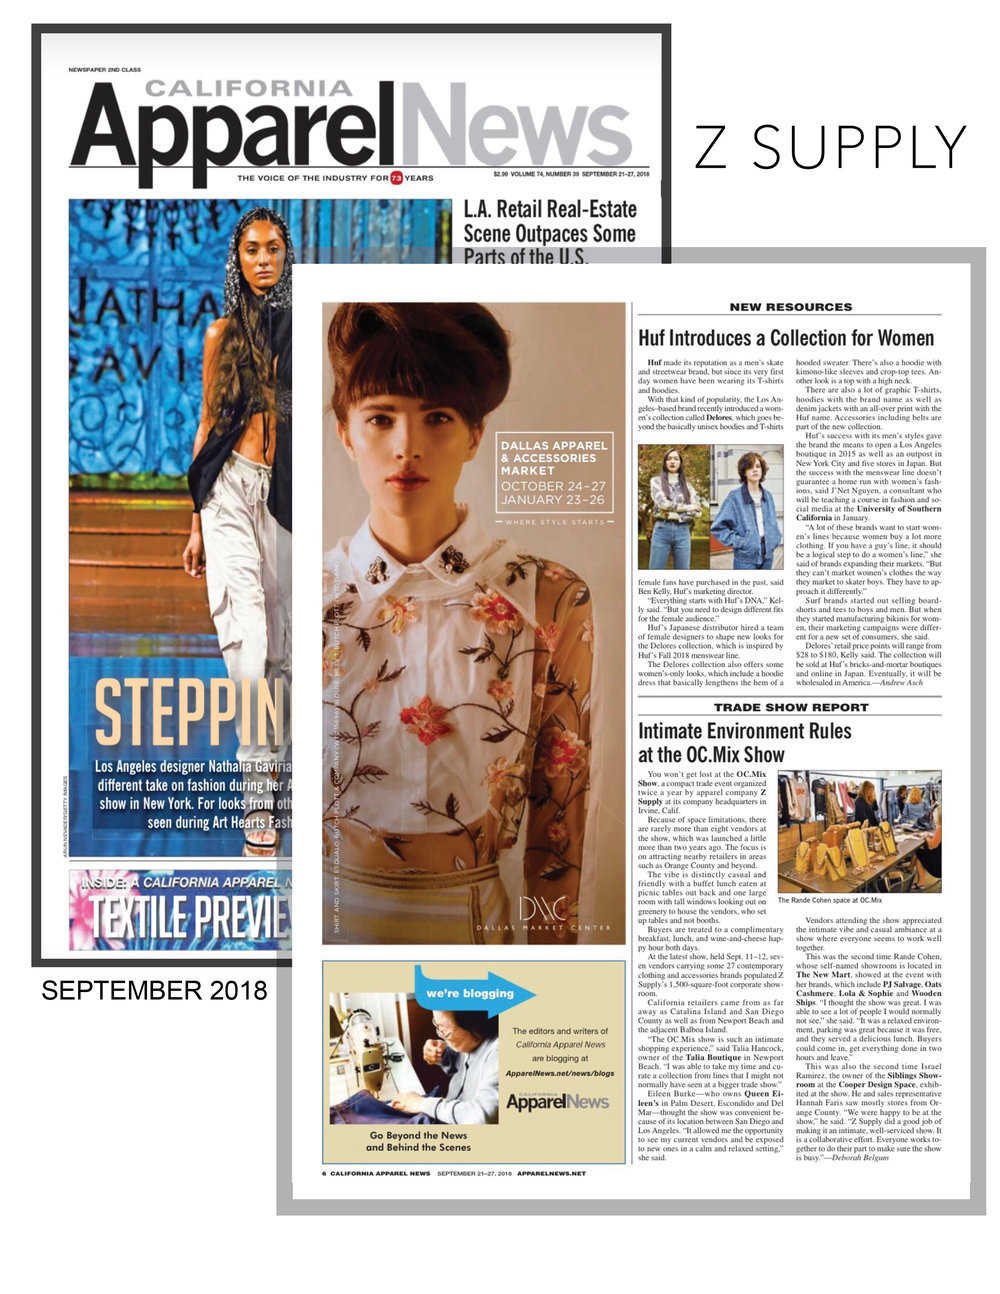 ZSupply_ApparelNews1_September2018.jpg